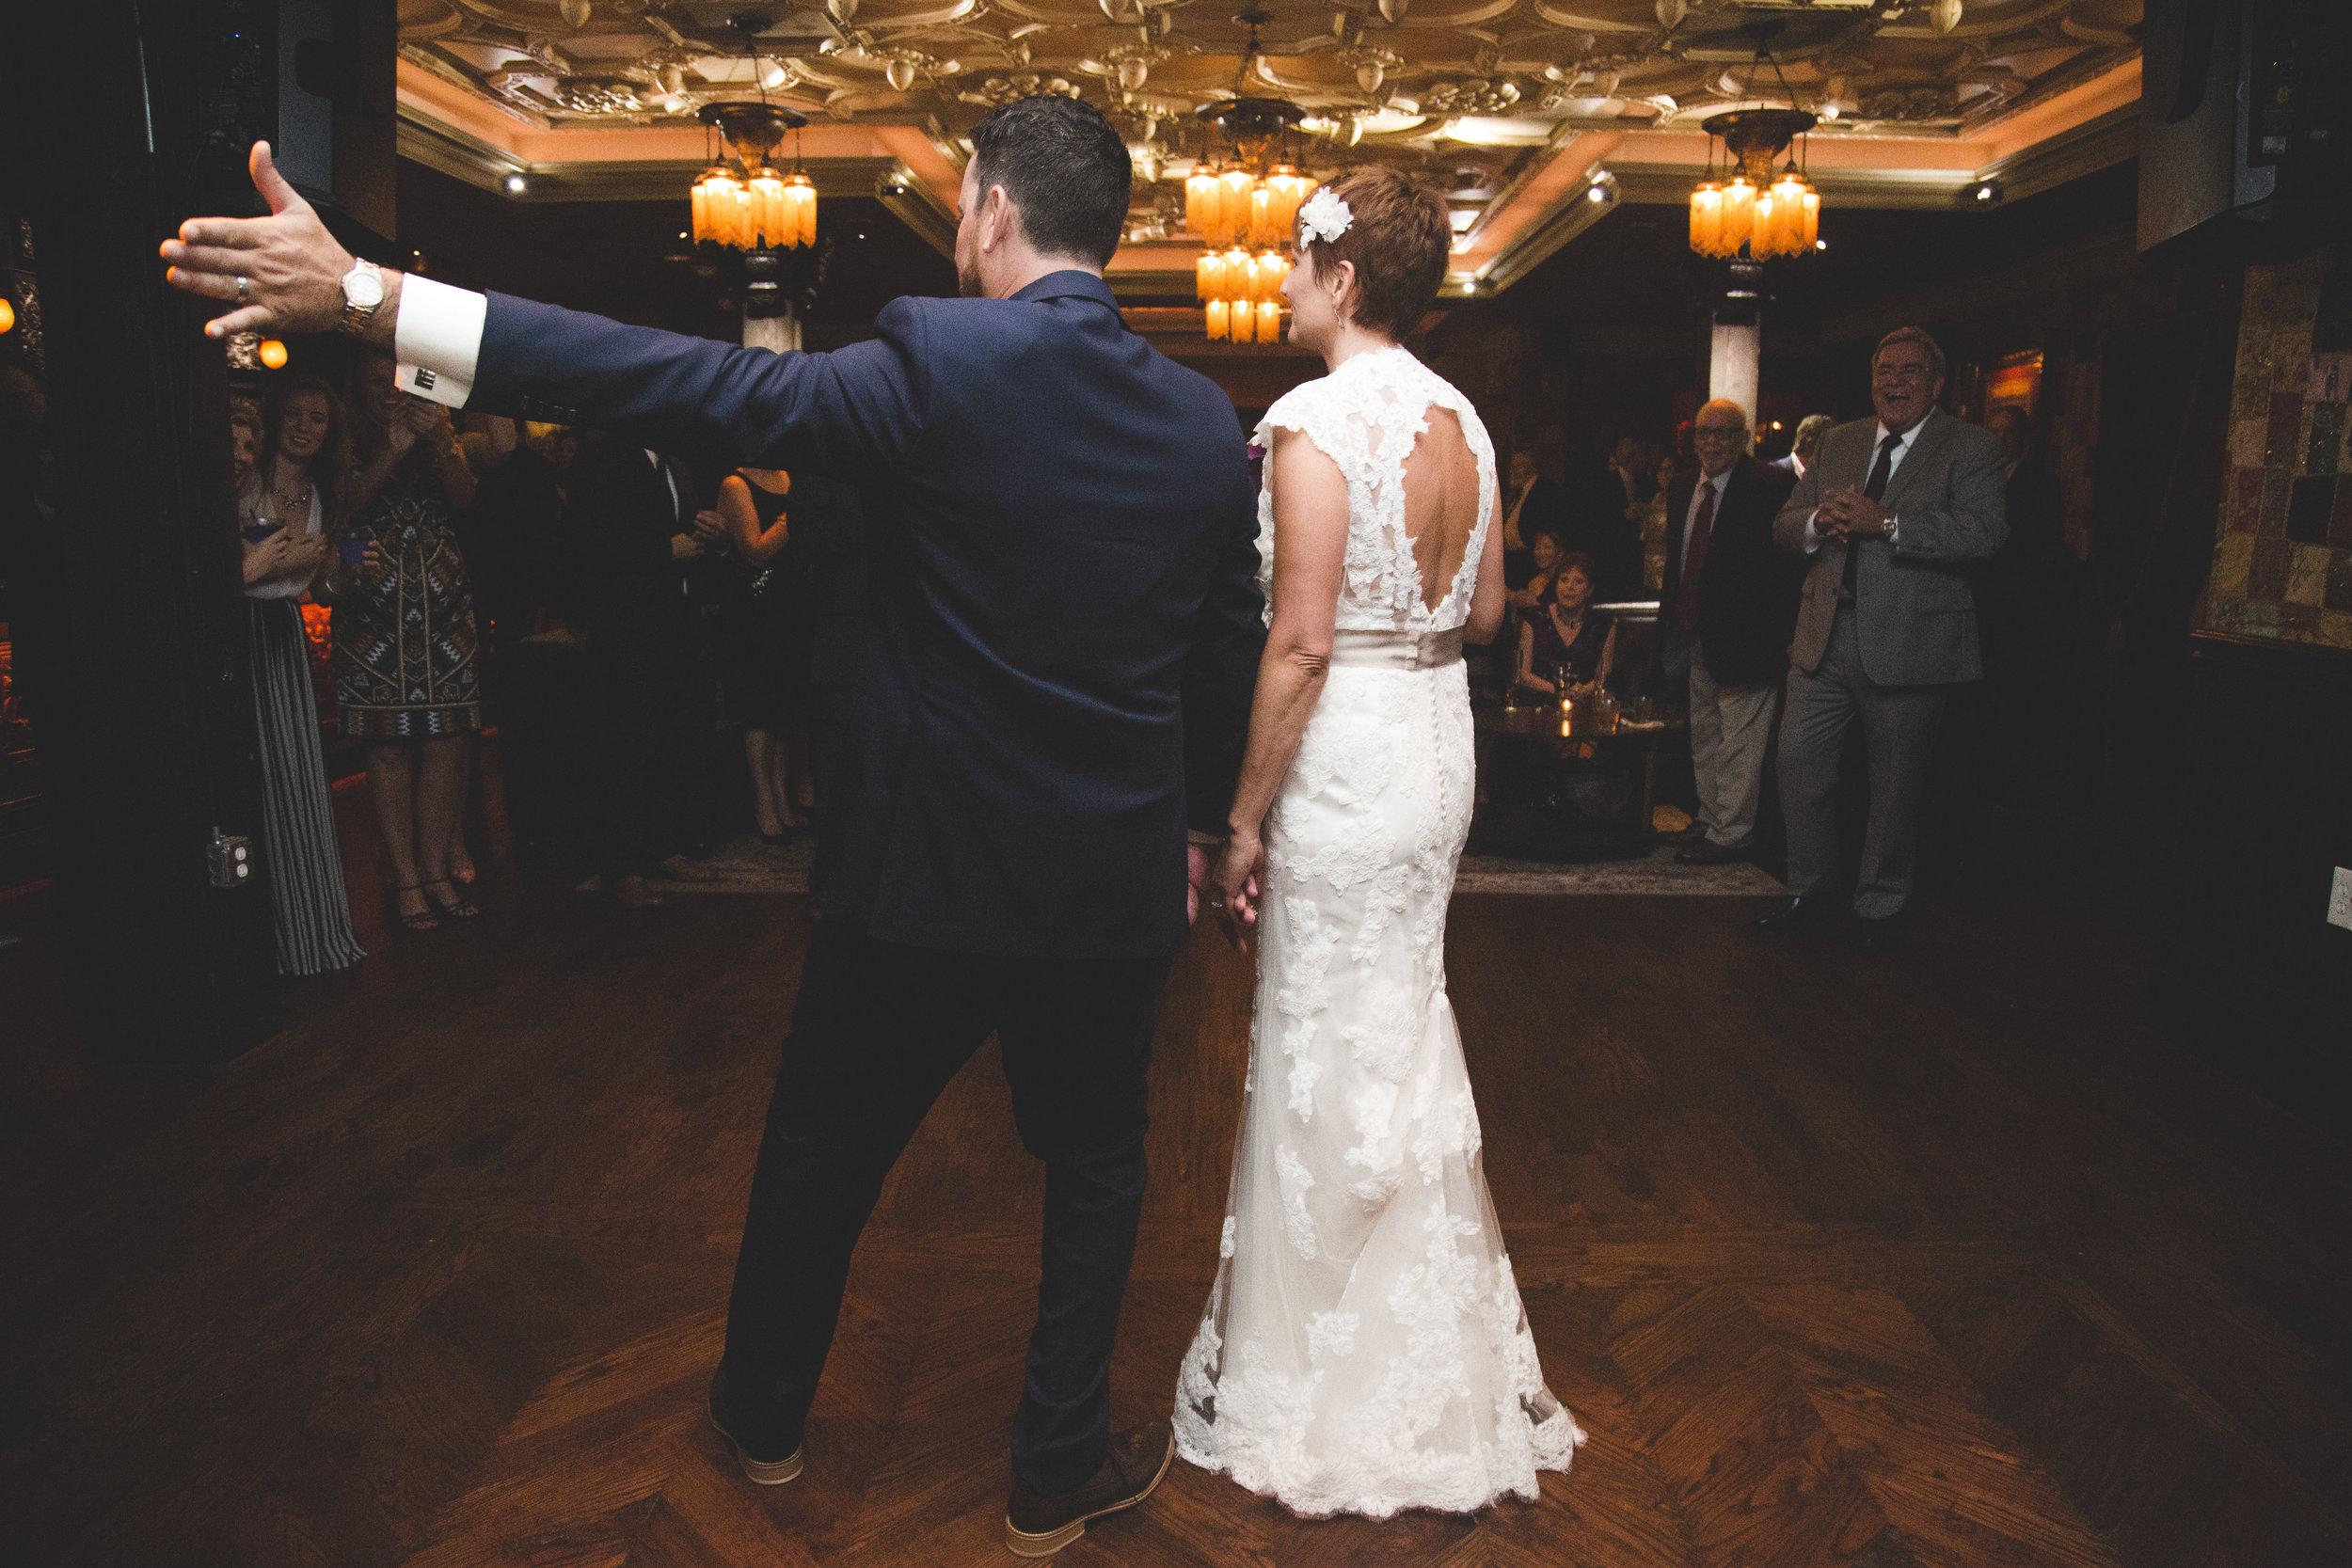 ATGI_Kat and Gabe Wedding 2016_2S8A5672.jpg